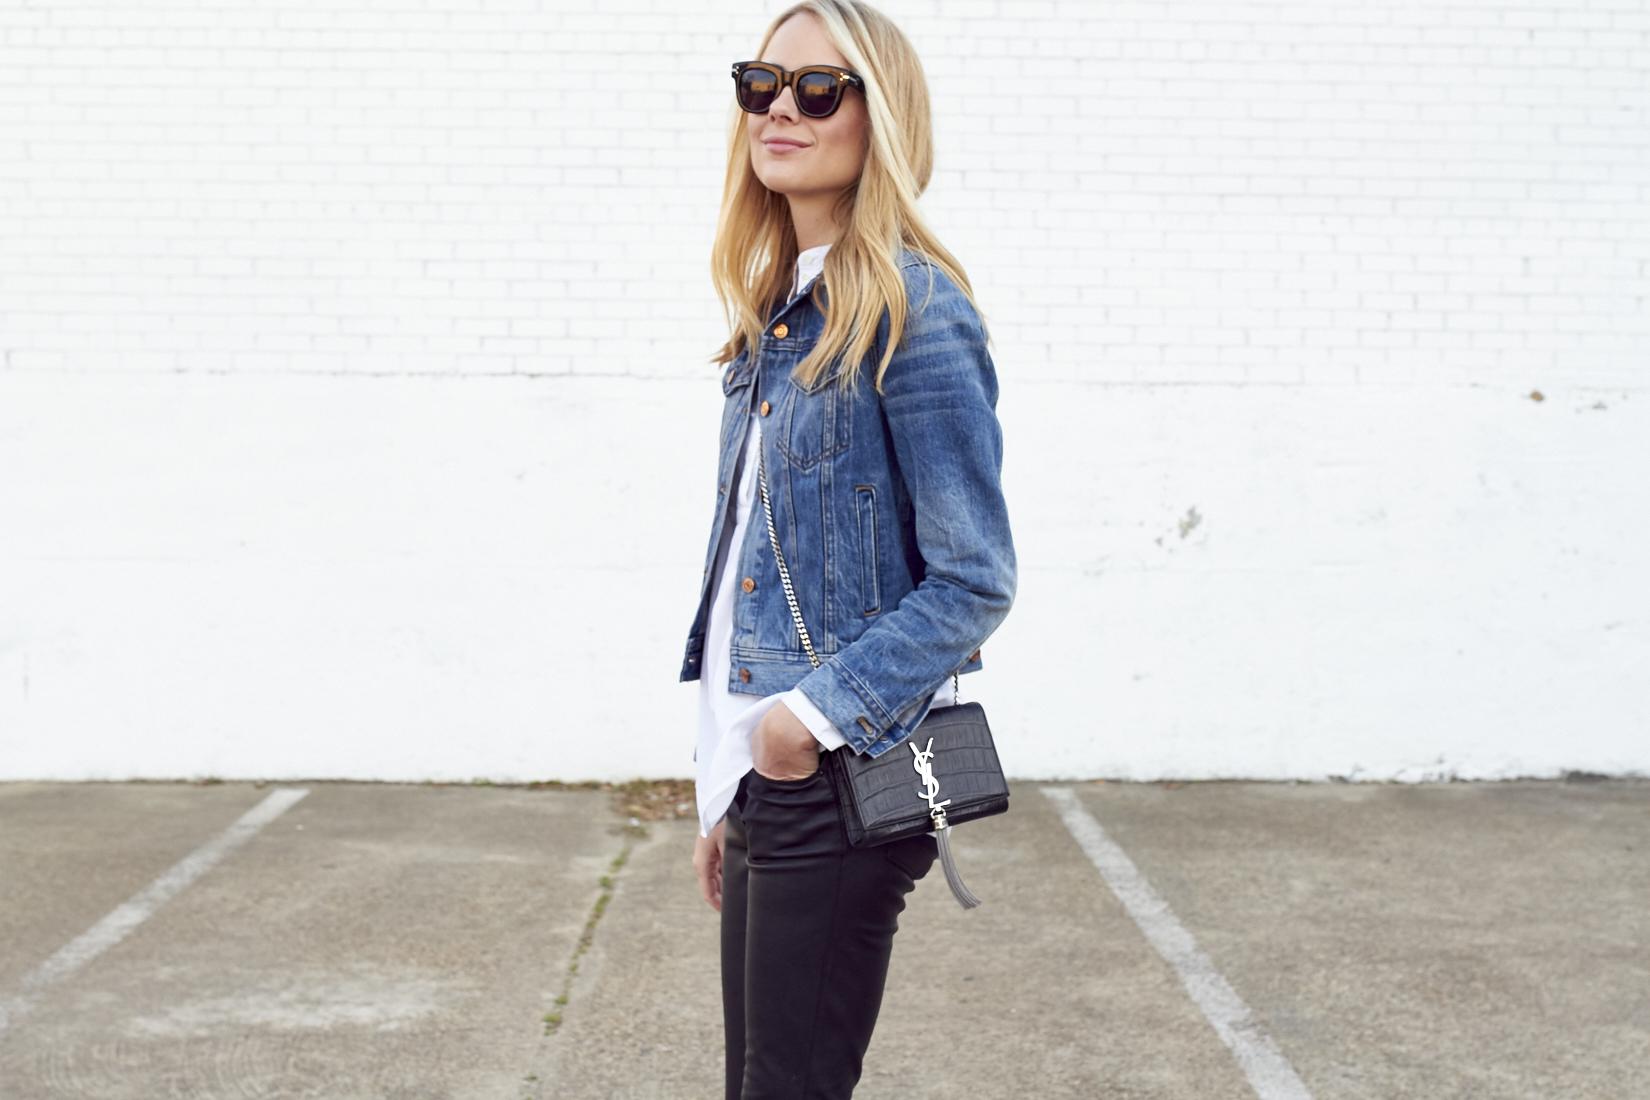 fashion-jackson-celine-sunglasses-jcrew-denim-jacket-saint-laurent-handbag